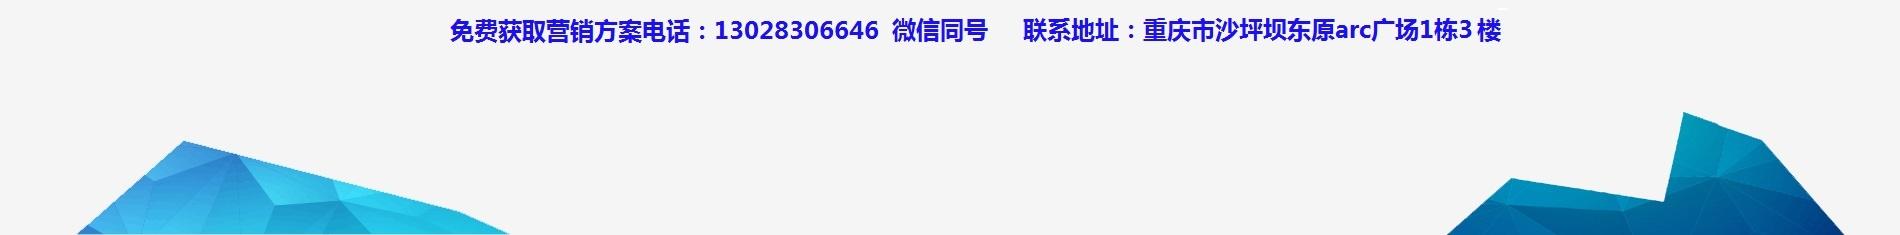 重庆网luotui广dian话